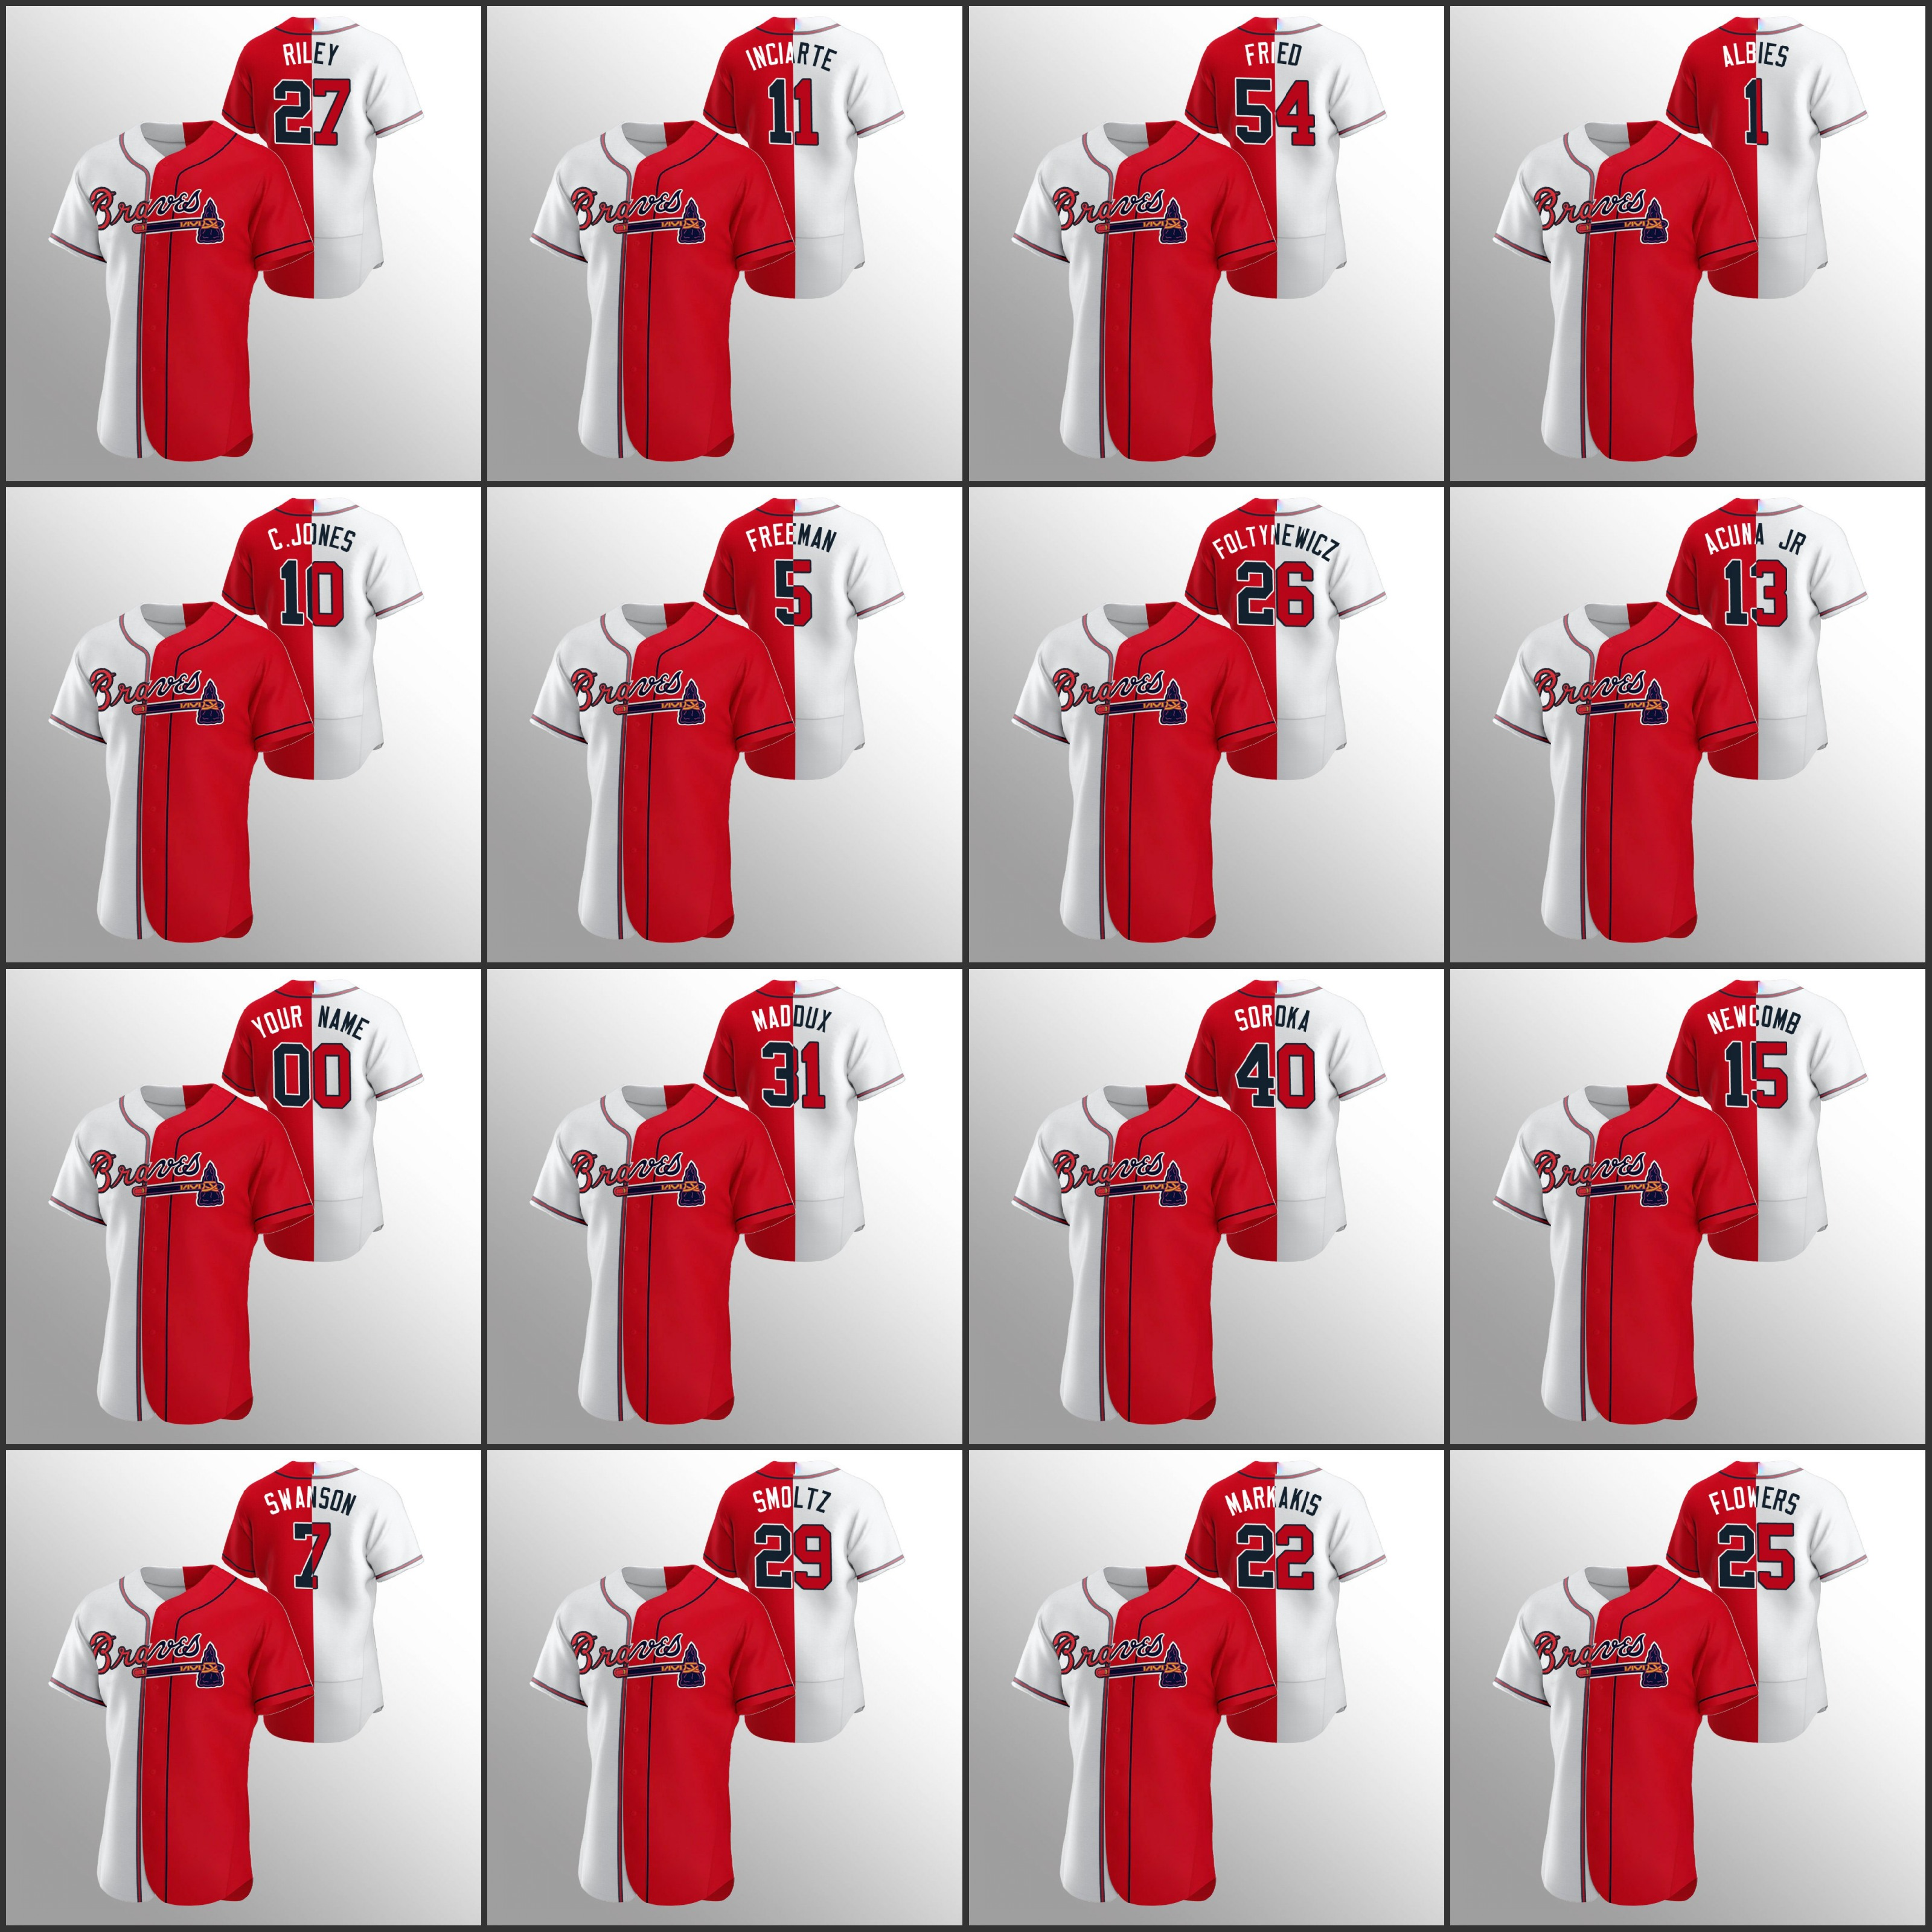 "Atlanta""Braves Men #27 Austin Riley 13 Ronald Acuna Jr. 5 Freddie Freeman 10 Chipper Jones Women Youth Custom White Red Color Split Jersey"